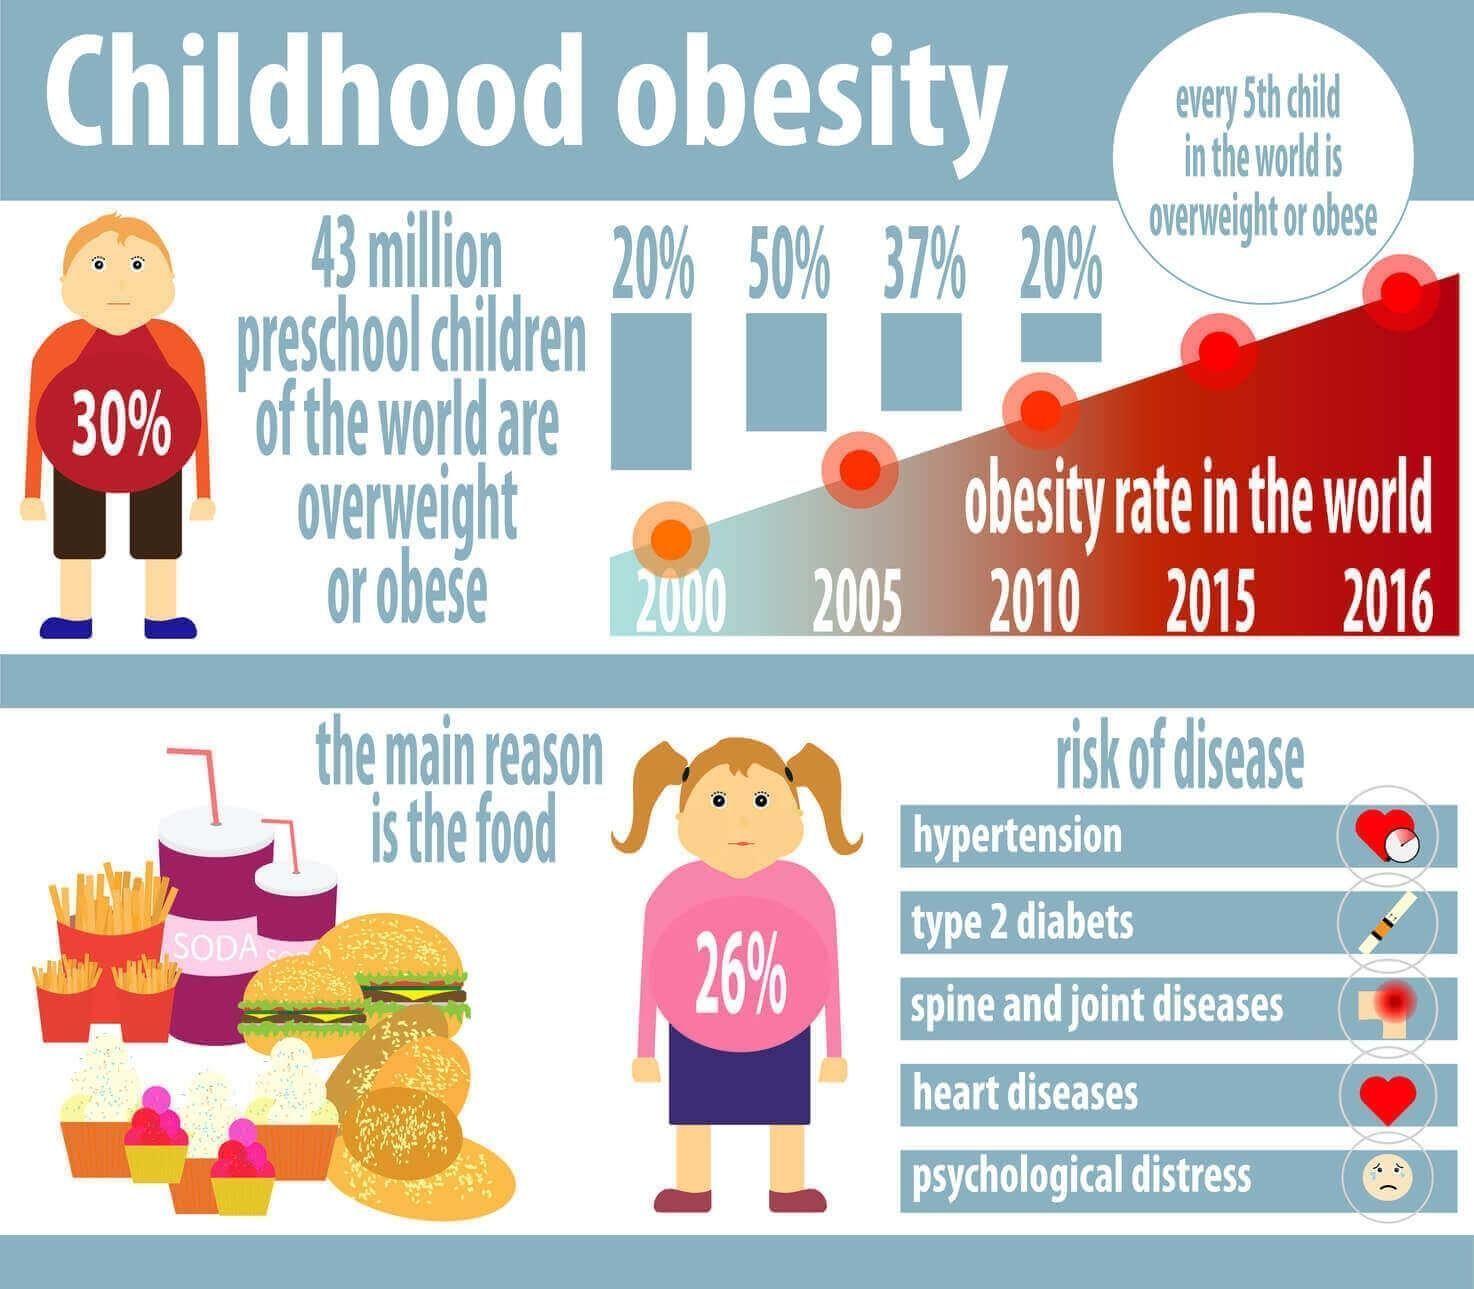 Obesity In Children Monster Pump Nutritions Supplement Supplier Children Monster Nutritions Obesity Pump In 2020 Childhood Obesity Obesity Awareness Obesity